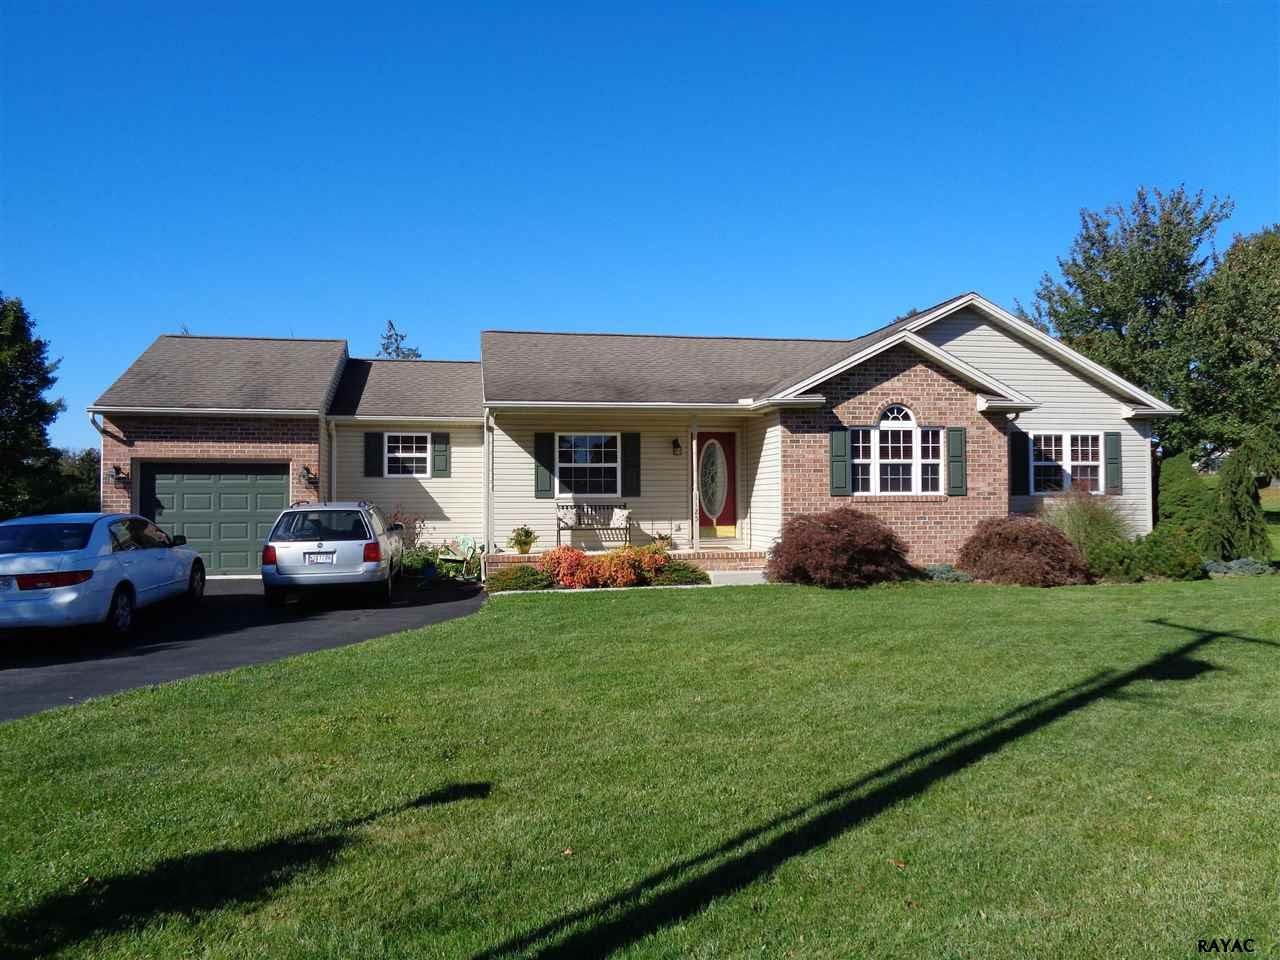 Rental Homes for Rent, ListingId:36392243, location: 1125 Westminster Ave Hanover 17331